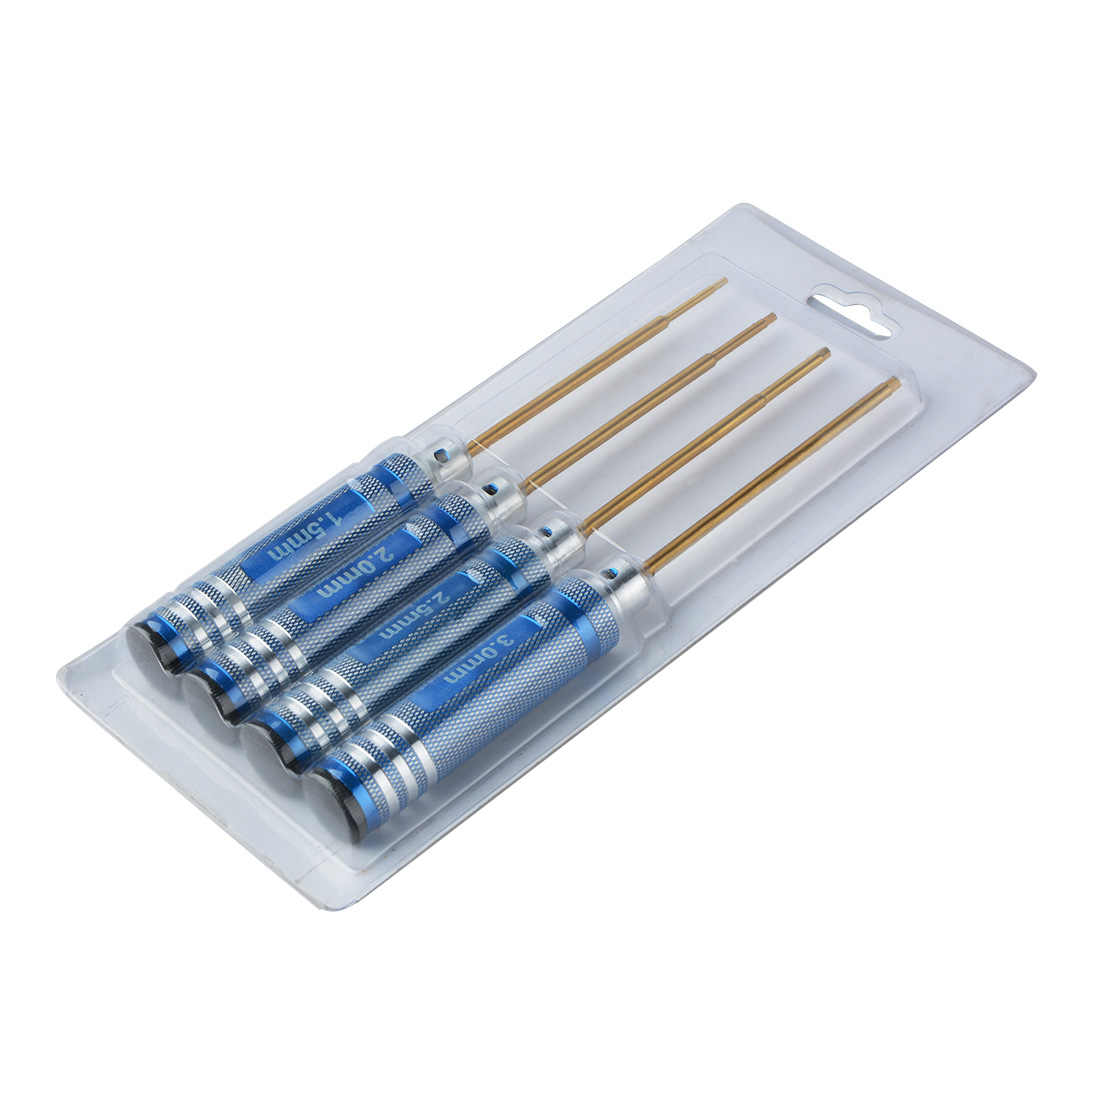 RC Universal Metal Model Tools Hexagon Screwdriver Blue/ Black Hex Nut Head Screw Driver Tool Set 1.5 2.0 2.5 3.0mm Kits